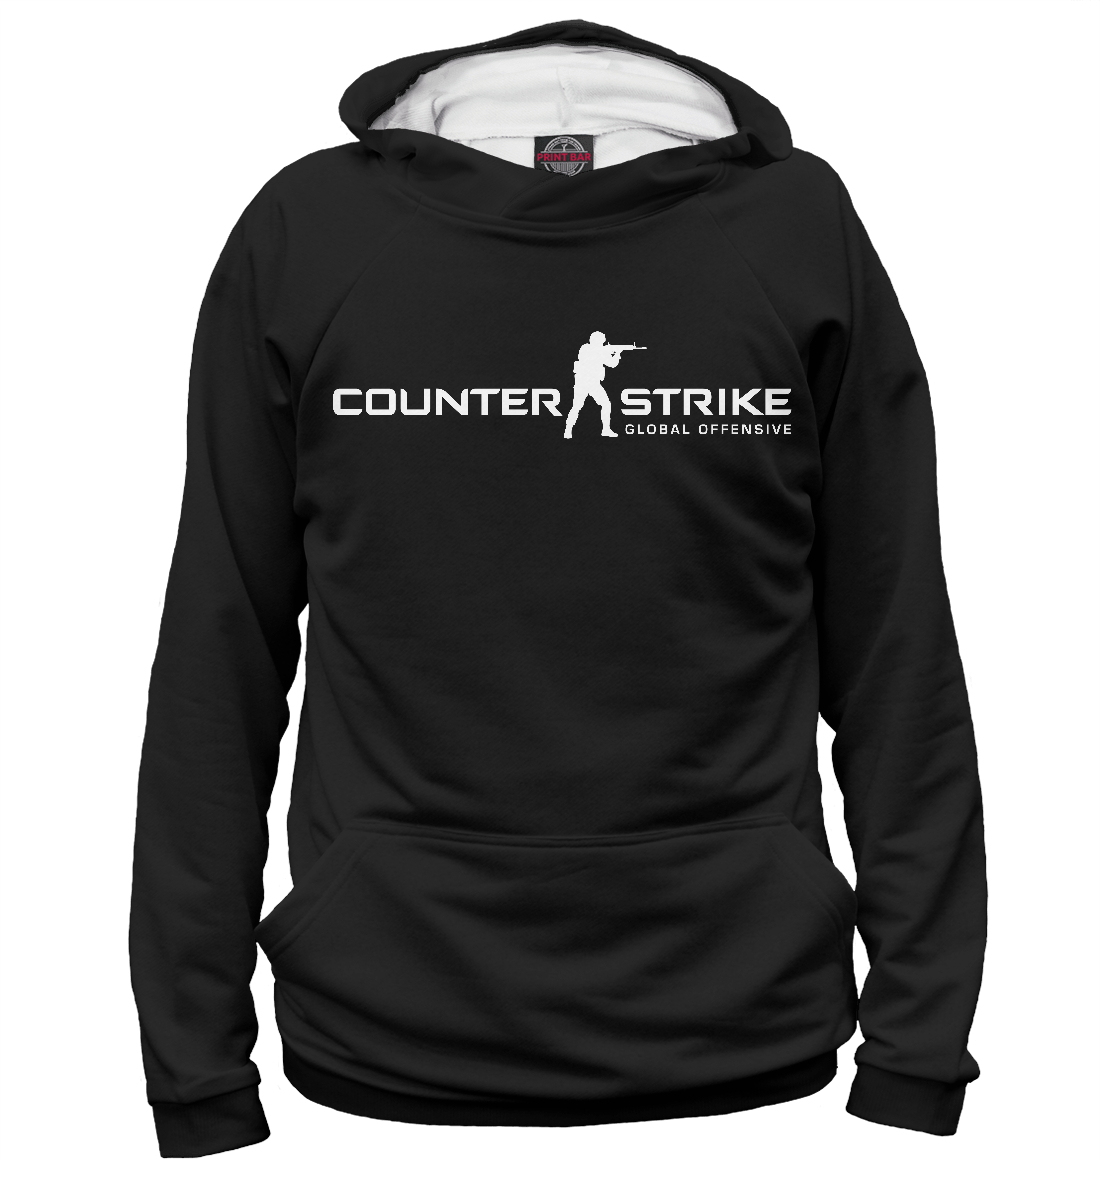 Купить Counter-Strike Global Offensive, Printbar, Худи, COU-920952-hud-1